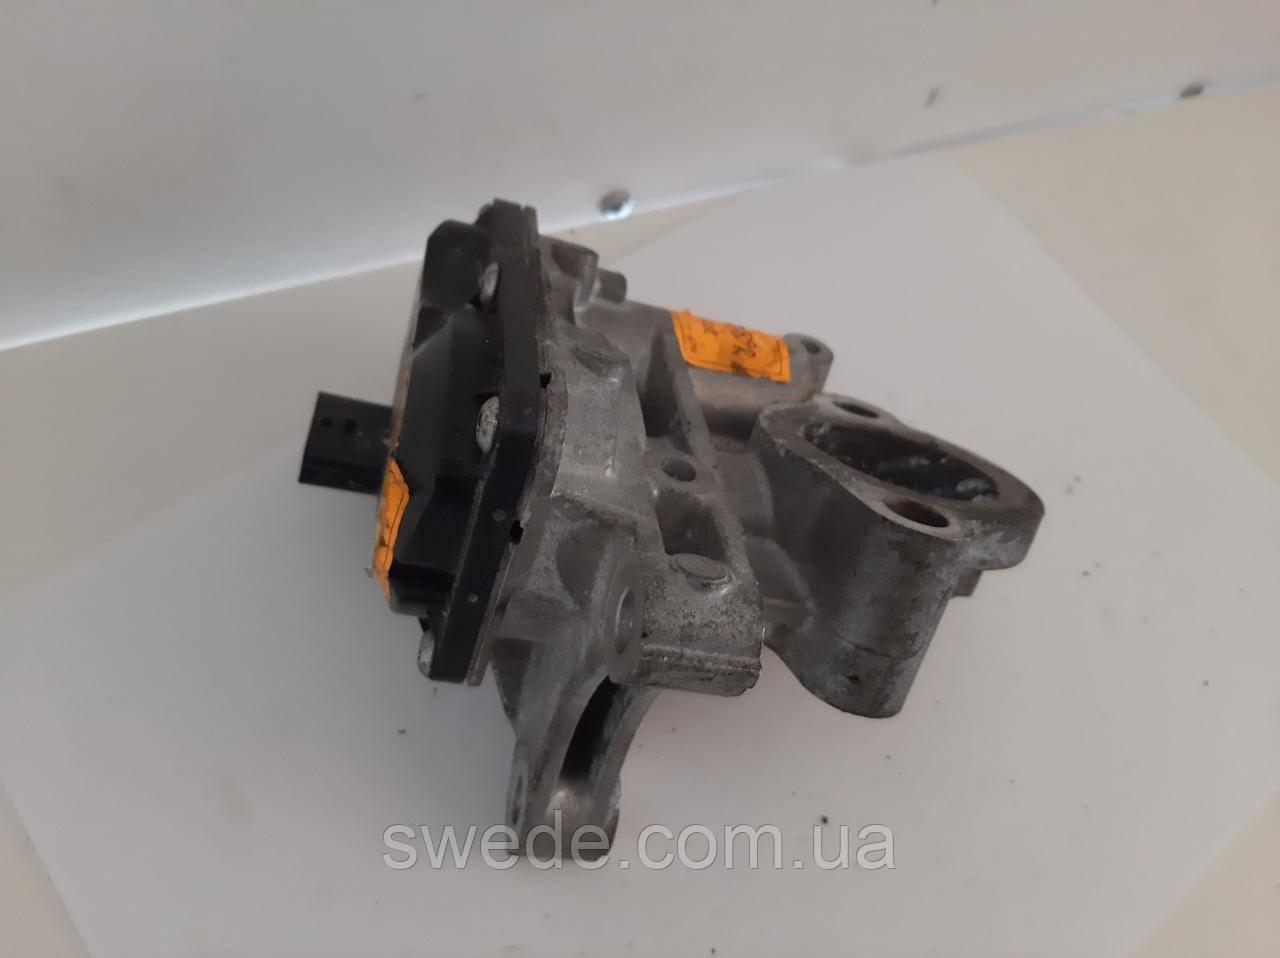 Клапан EGR Nissan Qashqai II 1.6 DCI 2013 гг 147100789R